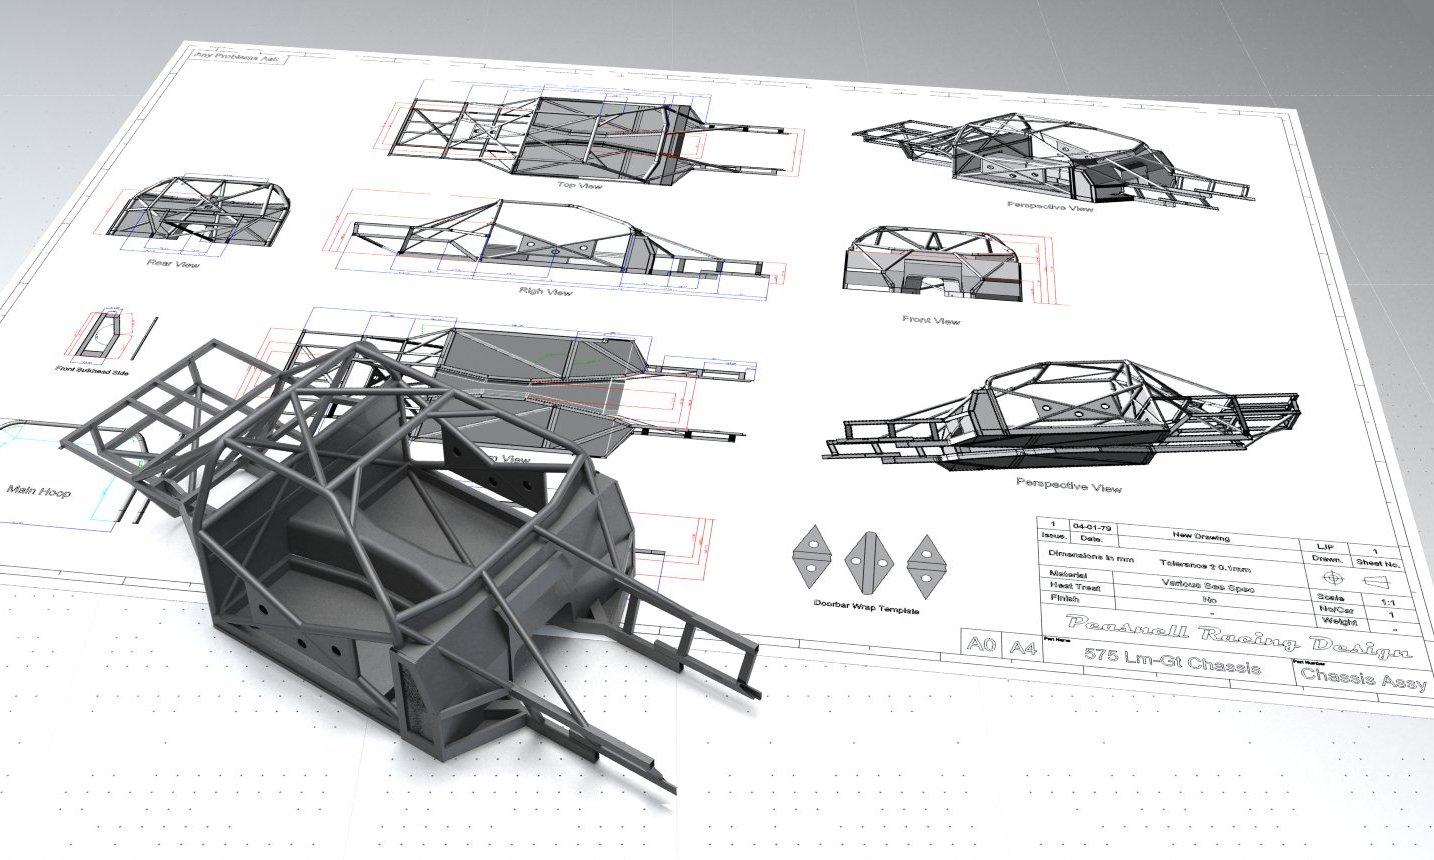 PEASNELL RACING DESIGN 575 GTC HILLCLIMB CAR DETAIL (2)